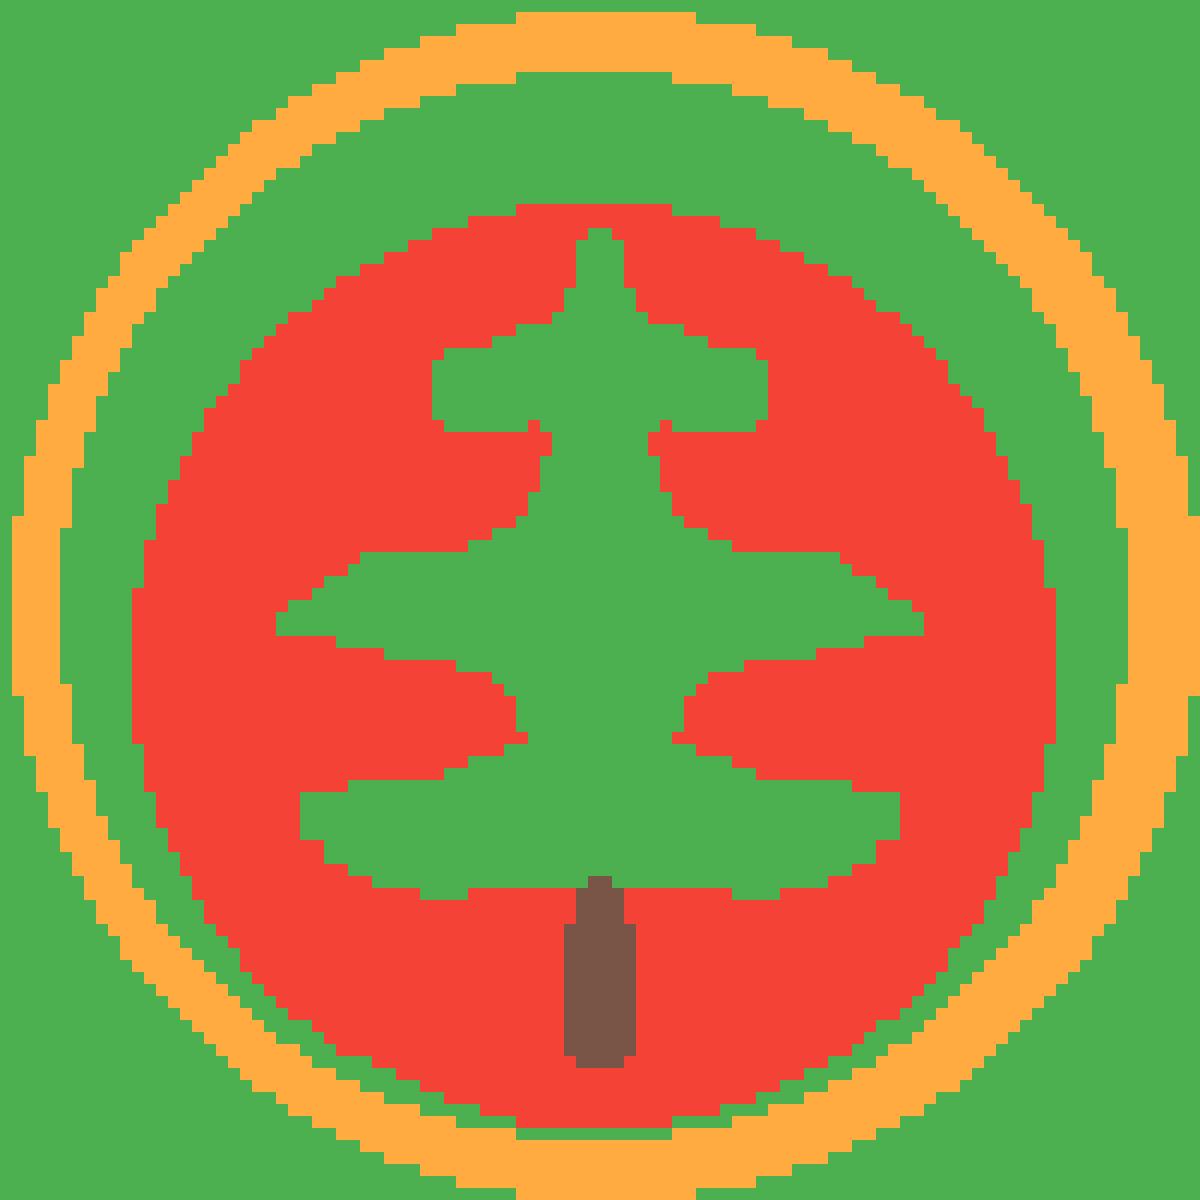 christmas cracker by dinkelburg